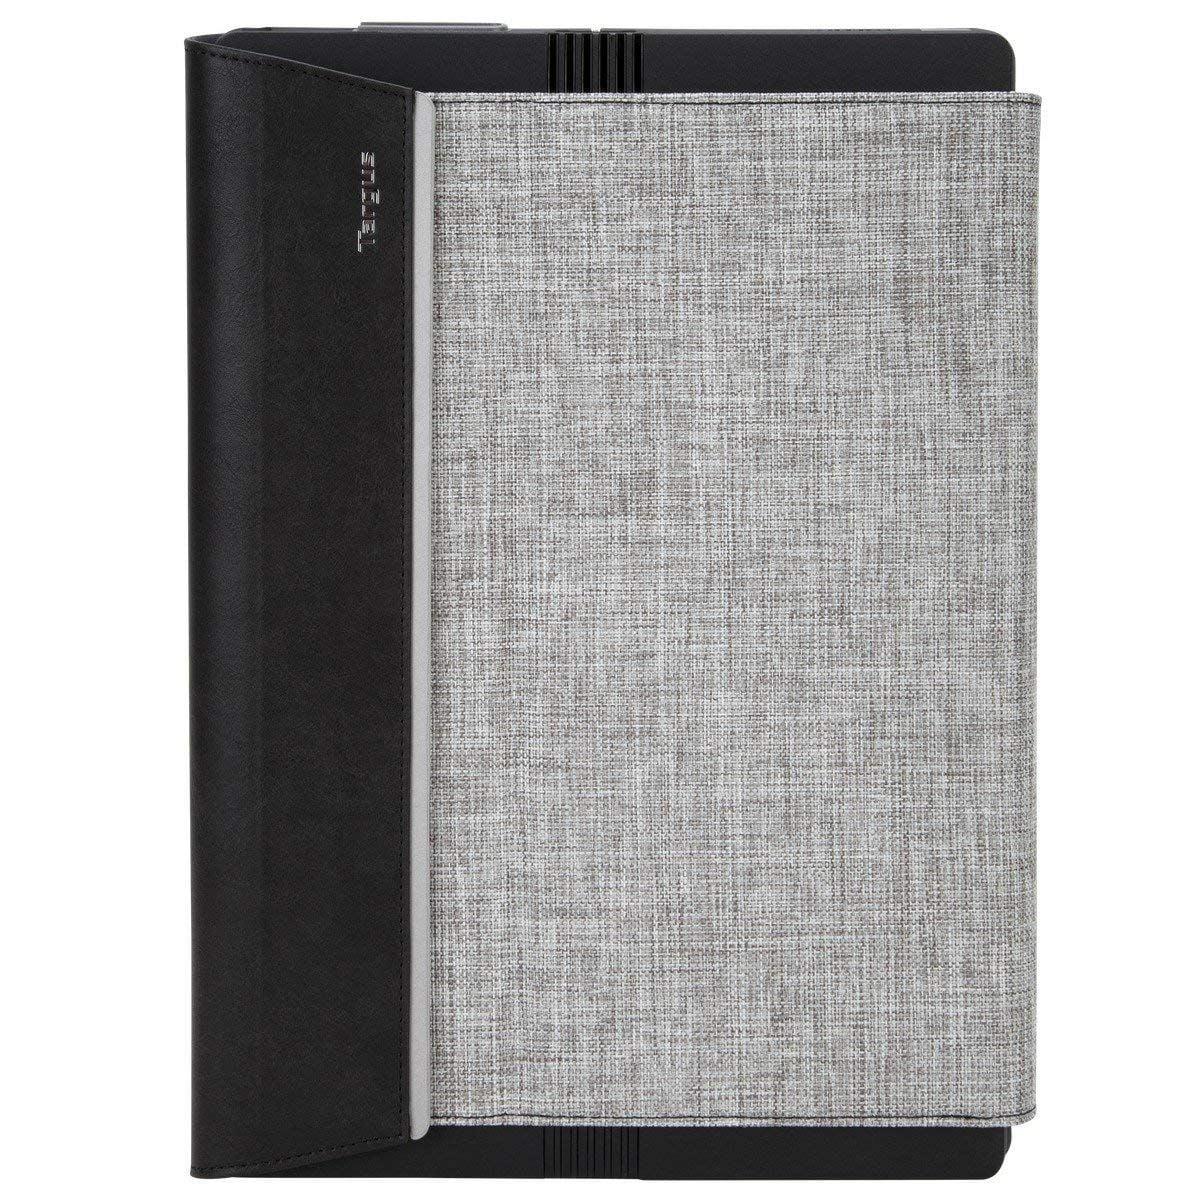 Targus Signature Folio Wrap + Stand Case for Microsoft Surface Pro 4 - Gray (Refurbished)